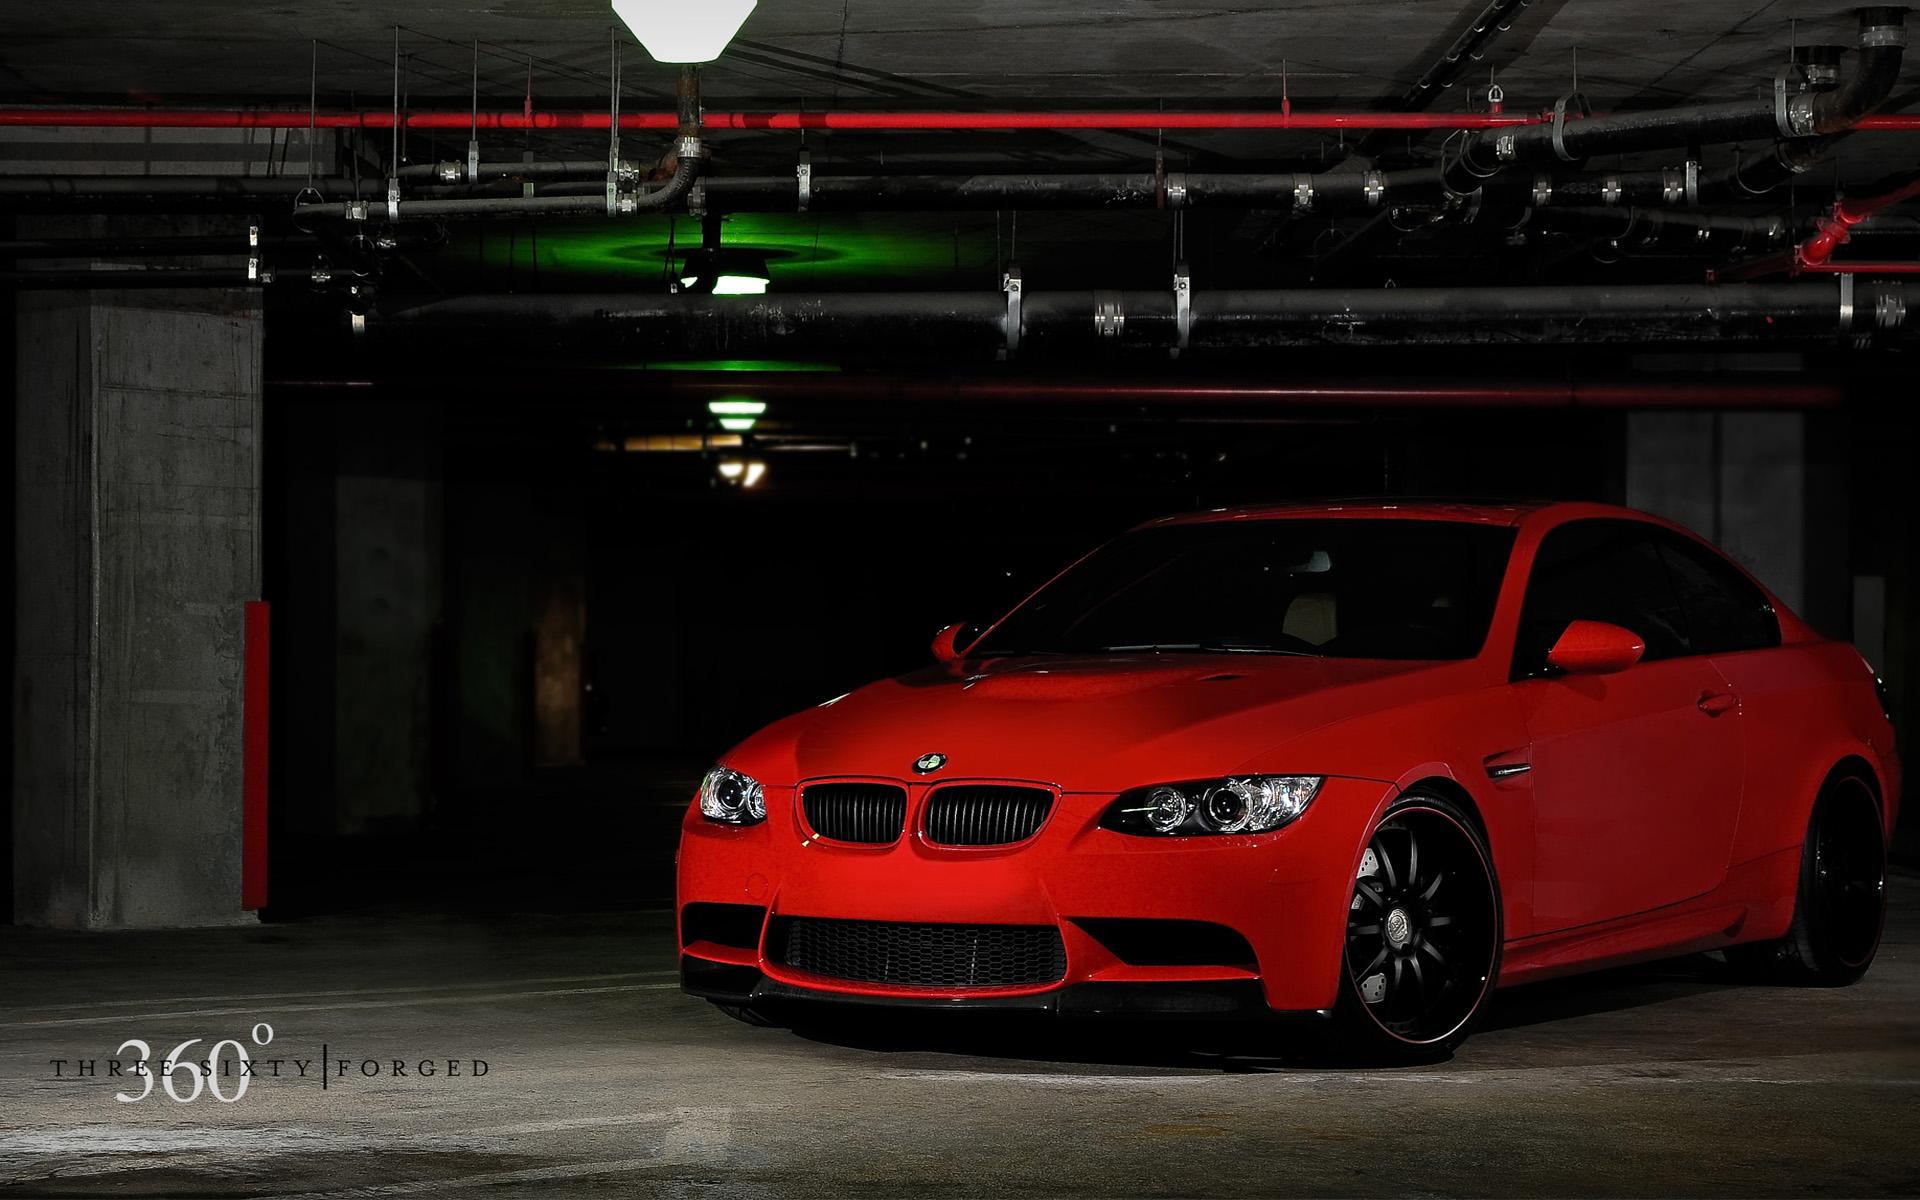 Red BMW M3 Wallpaper HD Car Wallpapers 1920x1200